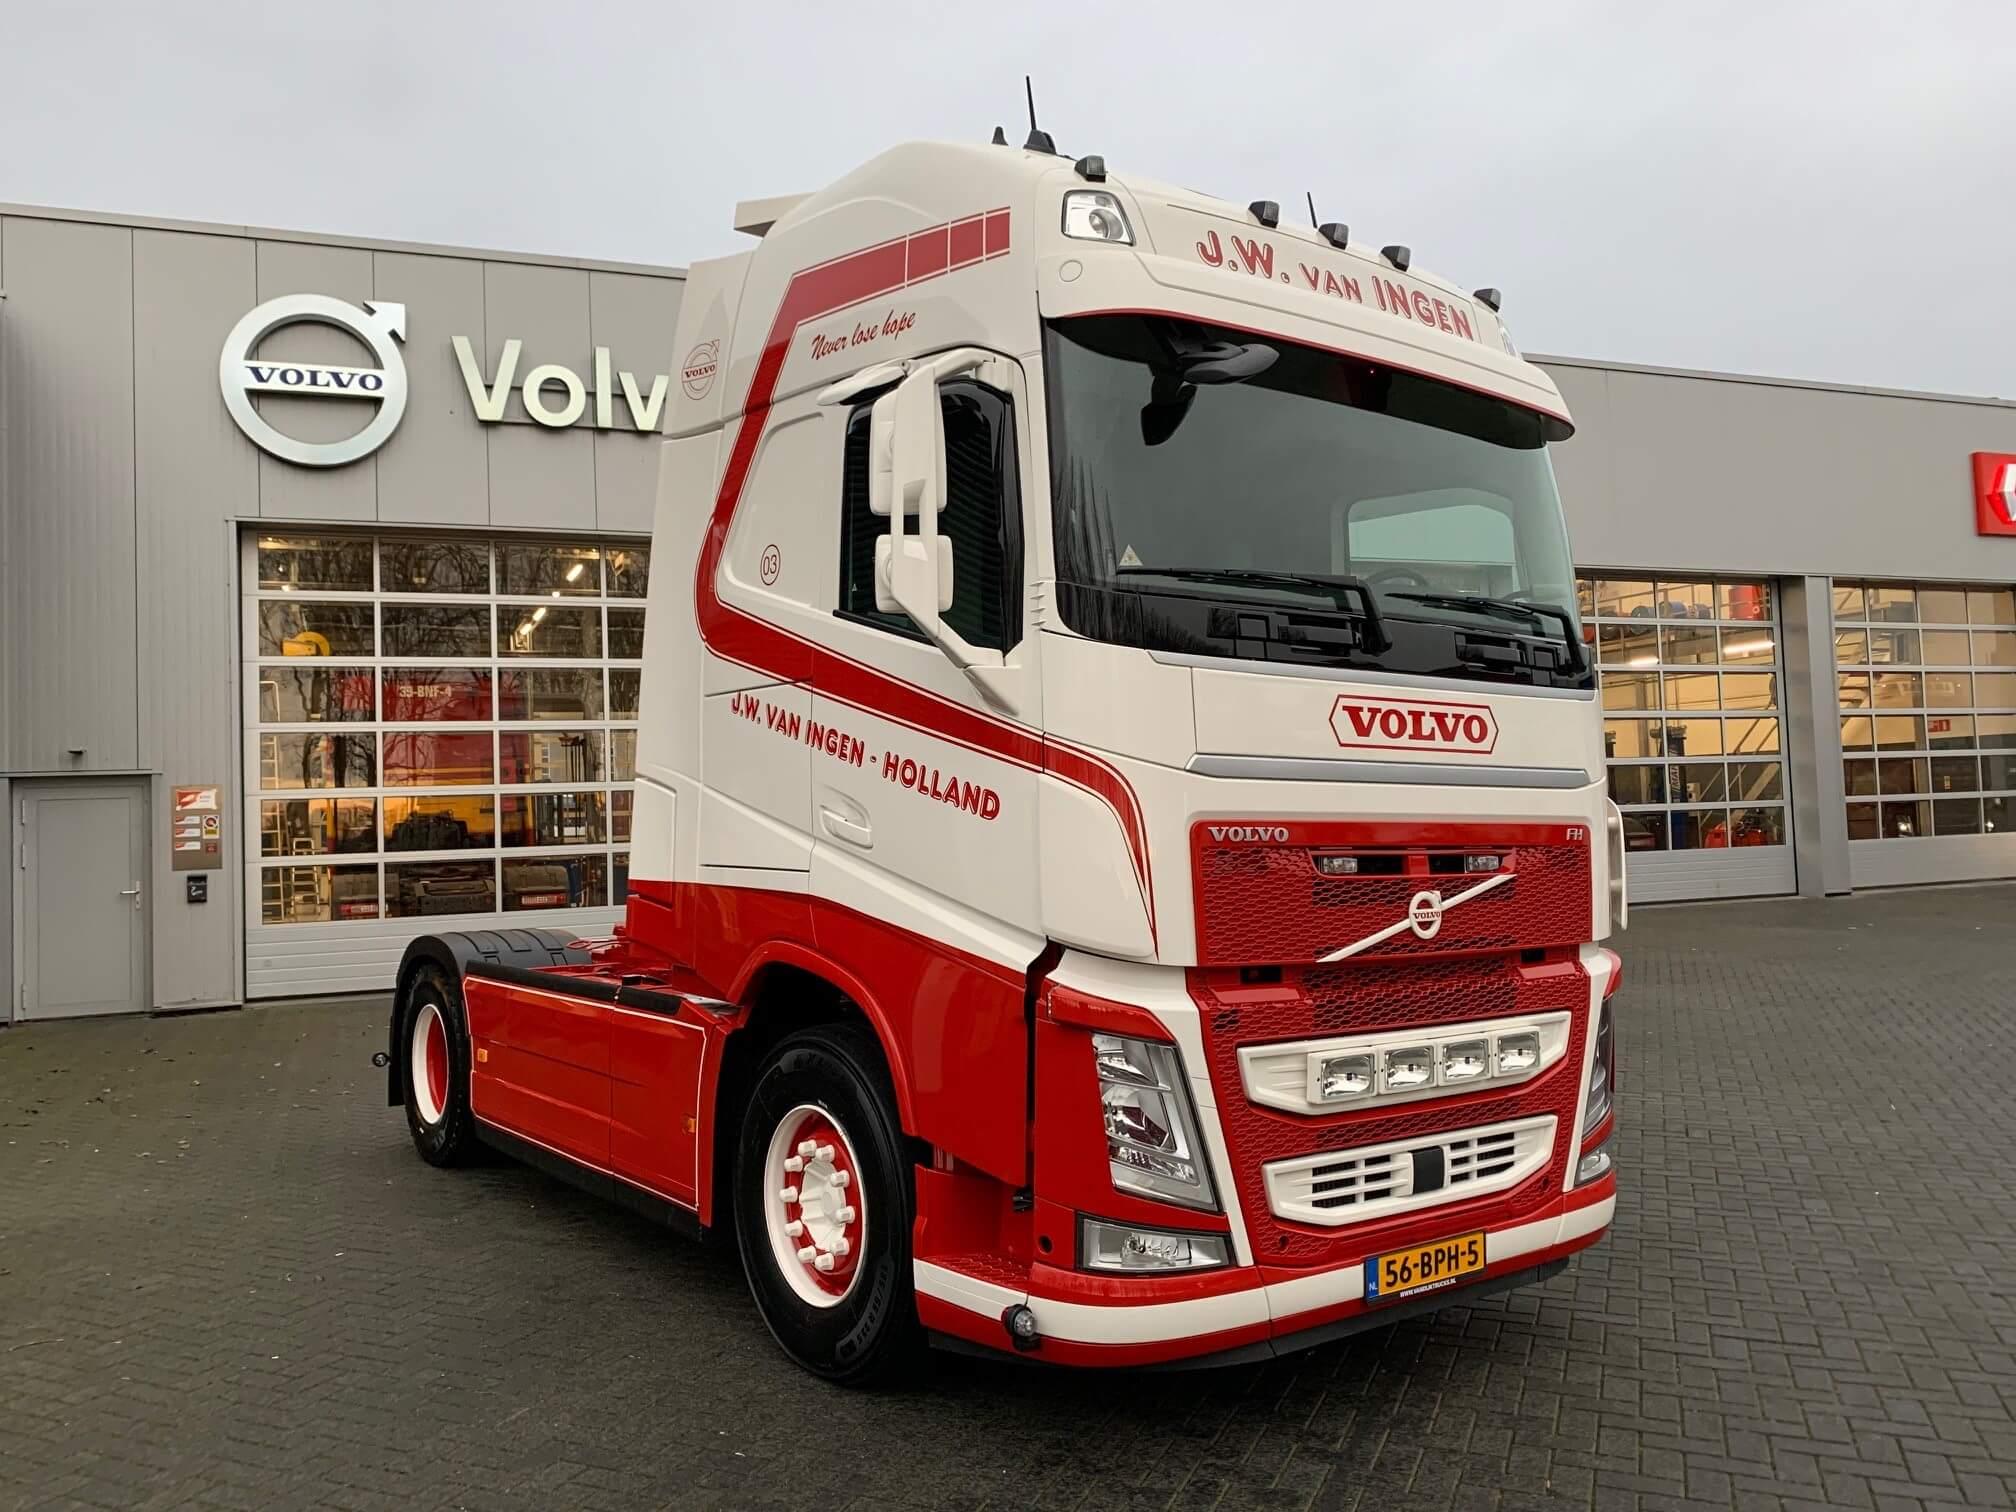 Volvo FH van Ingen Aflevering